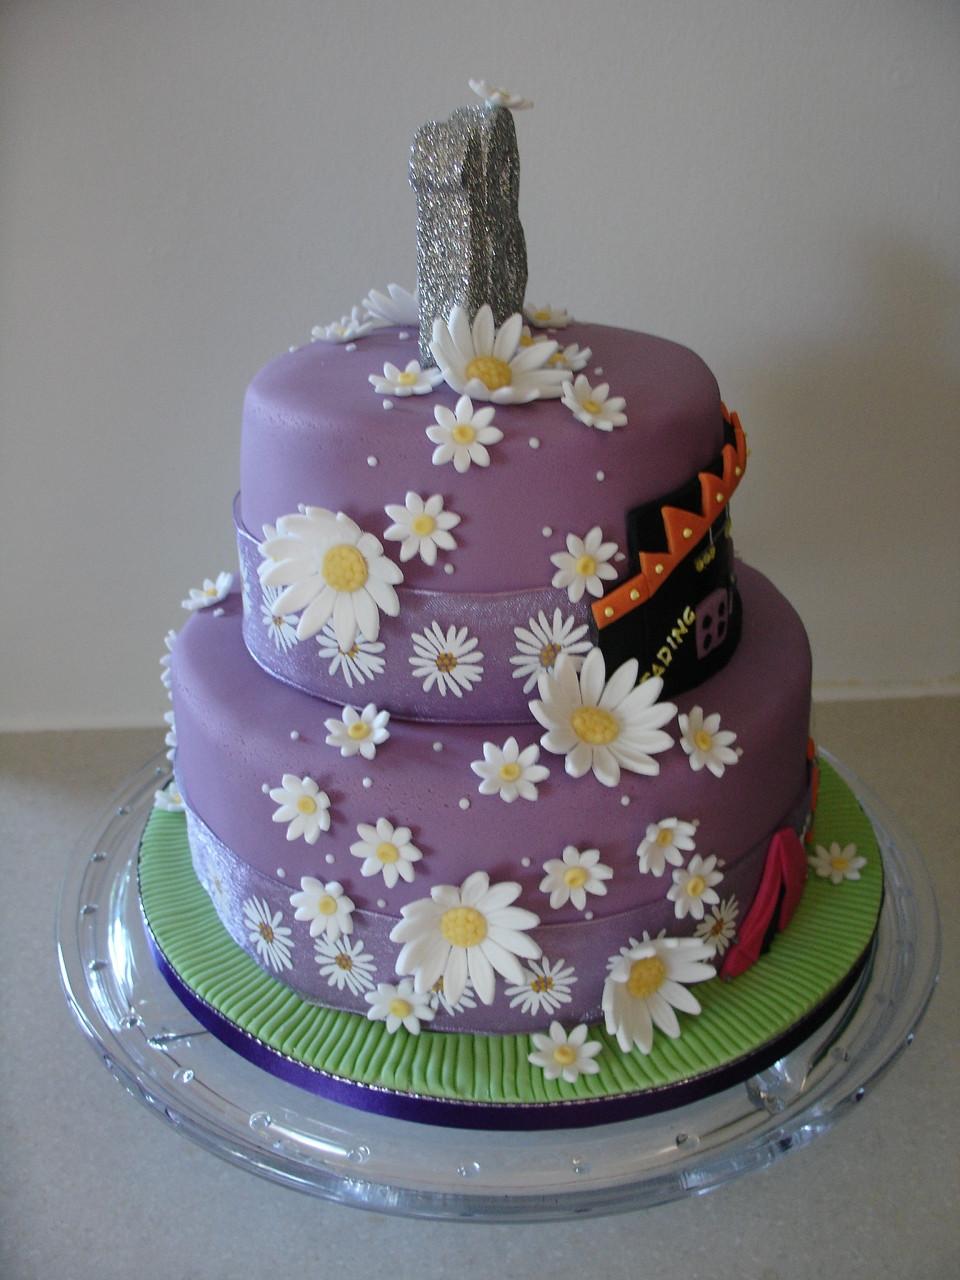 Fondant Birthday Cakes  Music Festival 18Th Birthday Fondant Cake CakeCentral